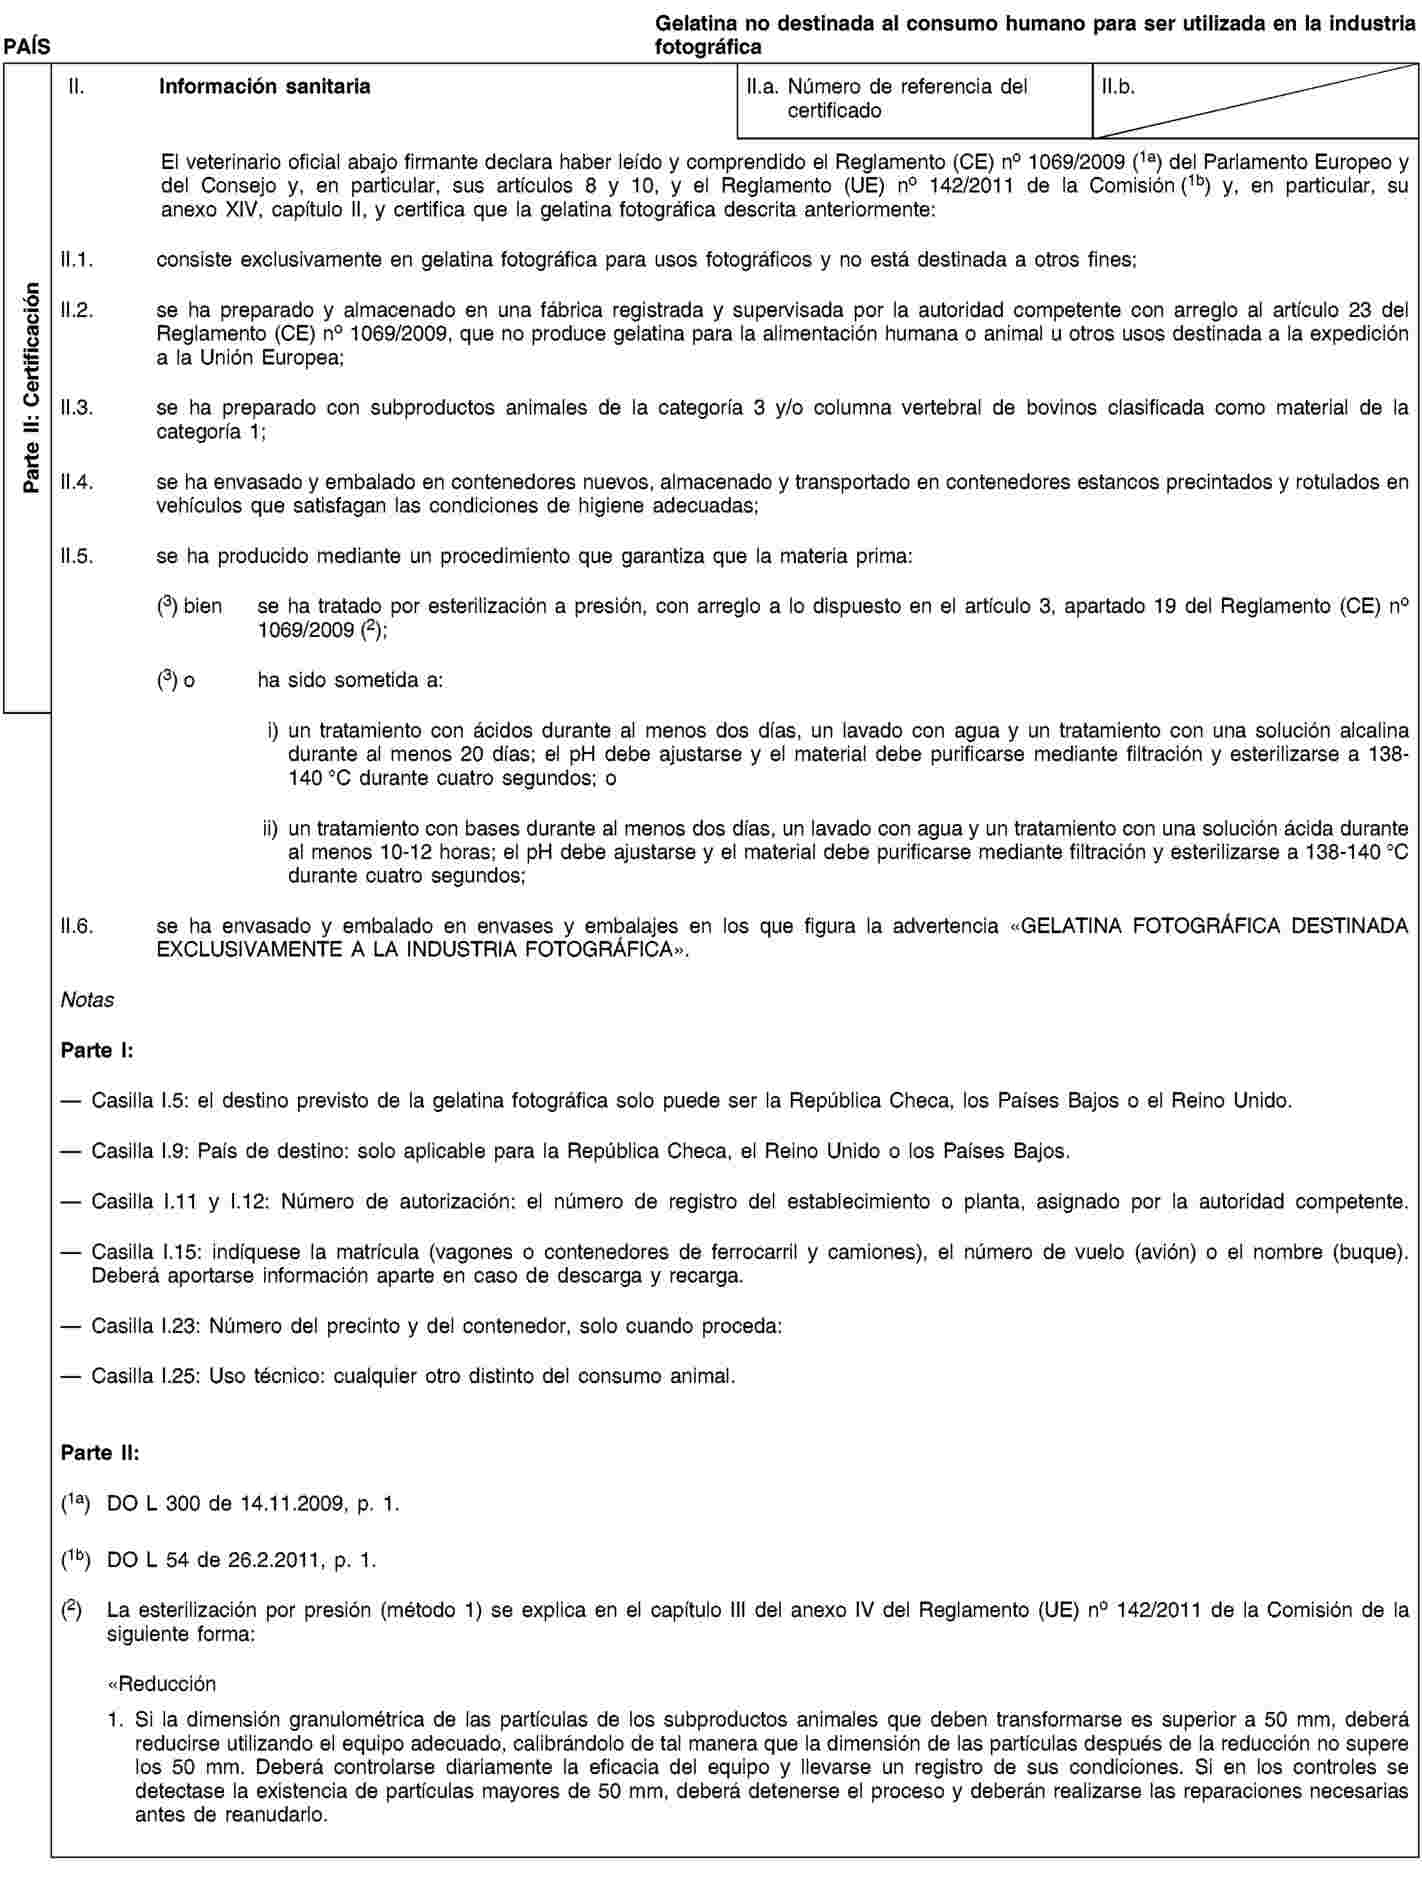 Imagen: https://eur-lex.europa.eu/resource.html?uri=uriserv:OJ.L_.2011.054.01.0001.01.SPA.xhtml.L_2011054ES.01024301.tif.jpg